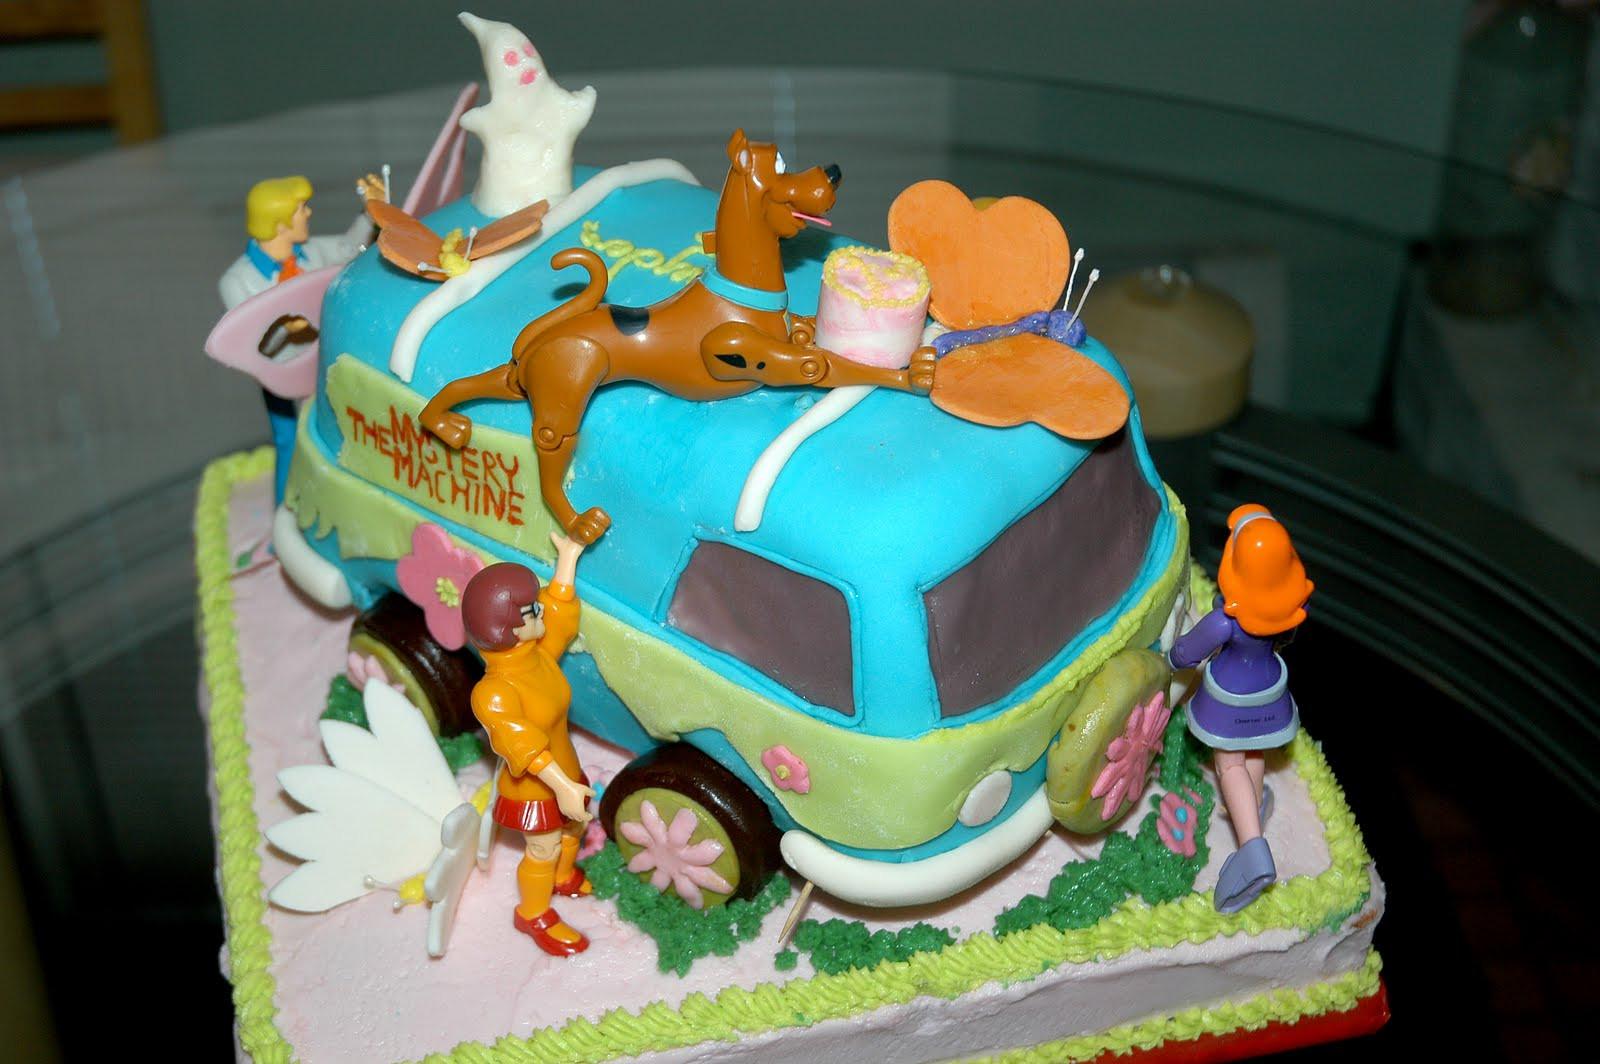 Scooby Doo Birthday Cakes  Creative Cakes Scooby Doo Happy Birthday to you